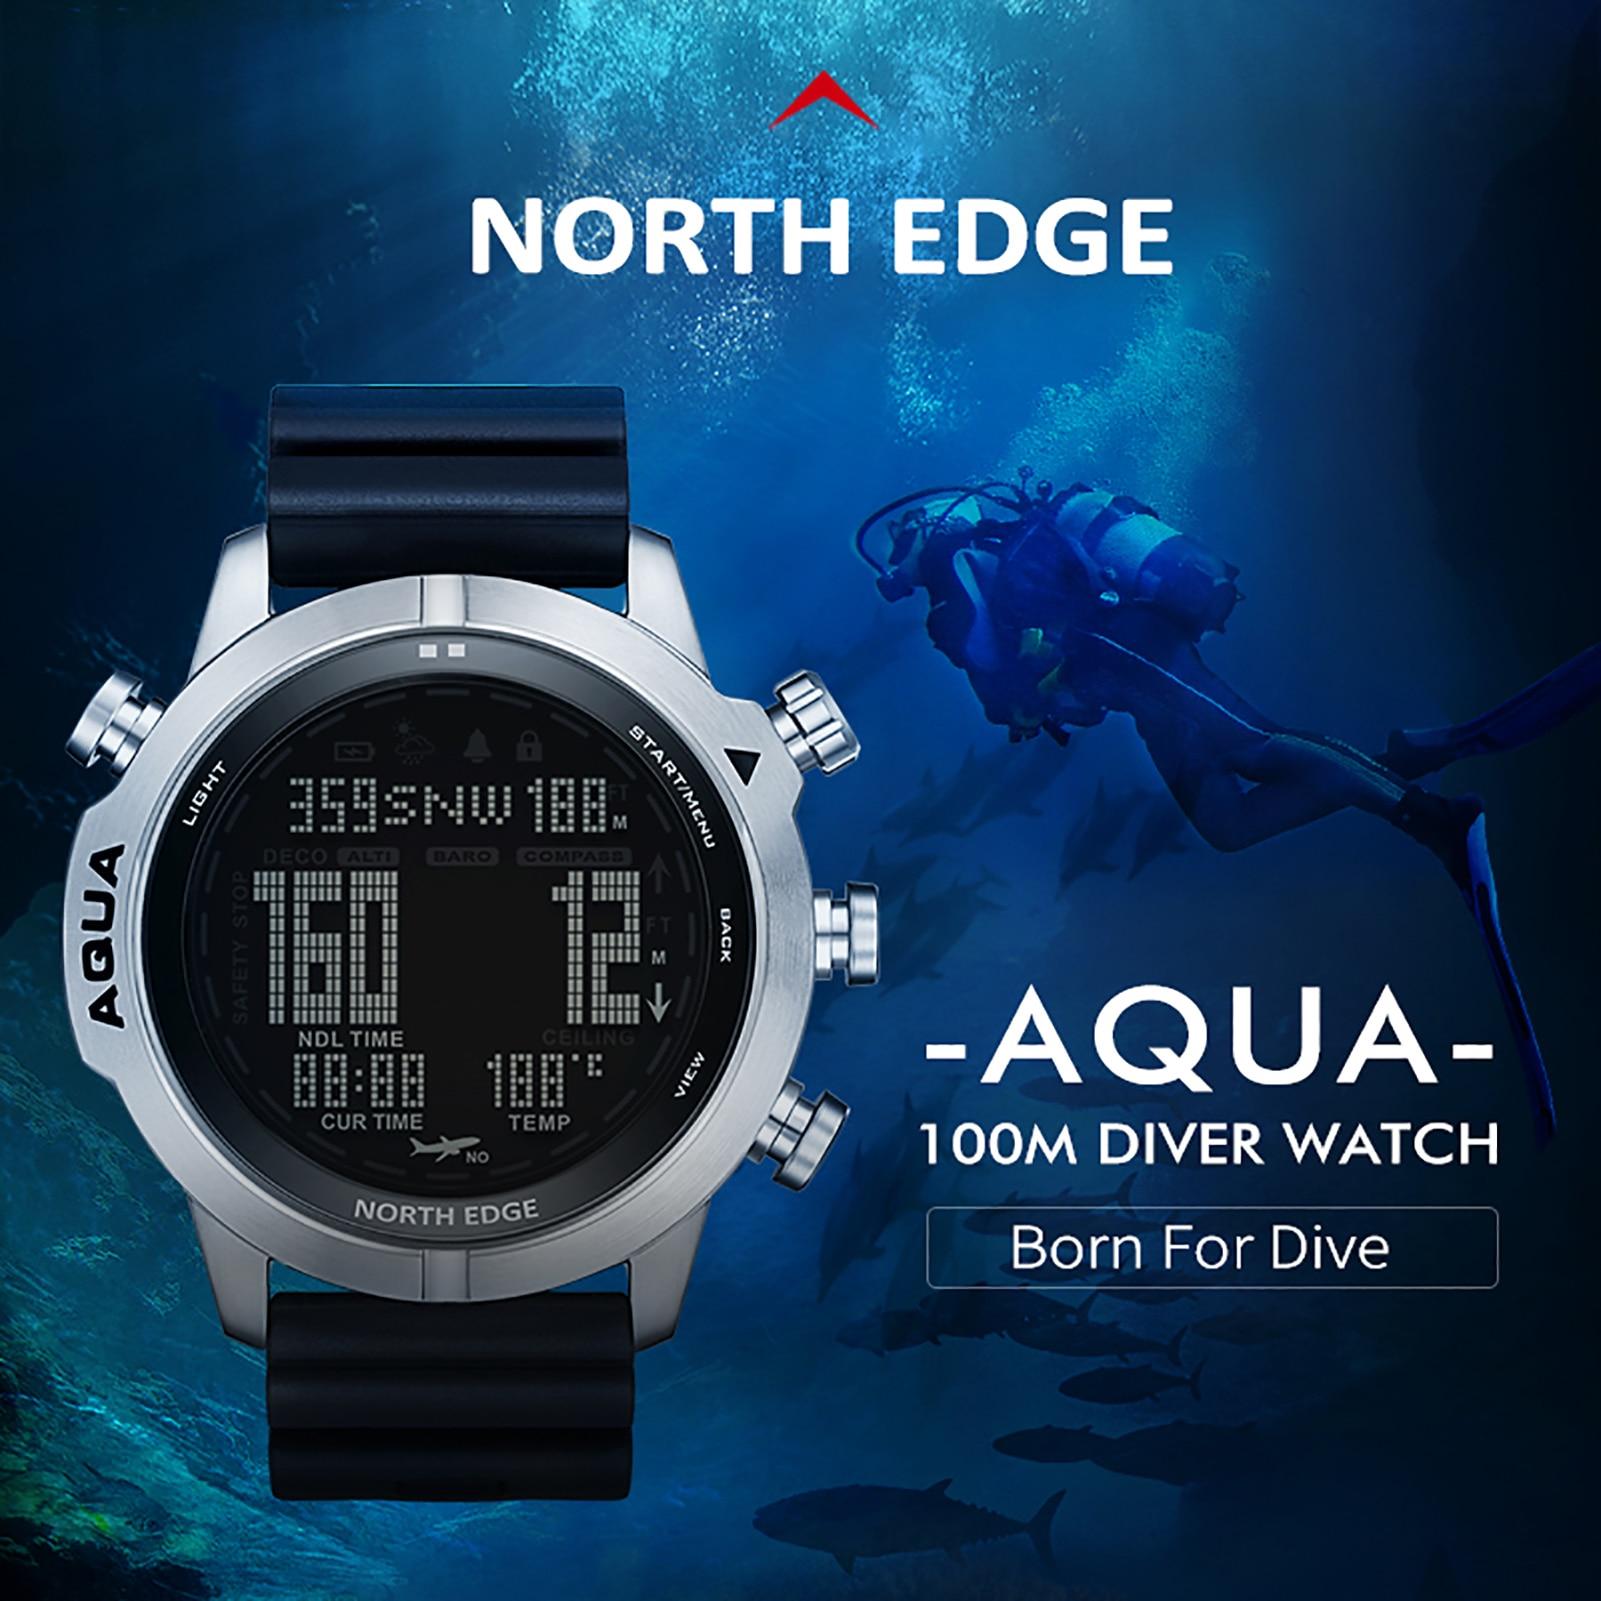 Get Men's Dive Computer Watch Waterproof 100M Smart Digital Free/Scuba Diving Watches Altimeter Barometer Compass Temperature Clock